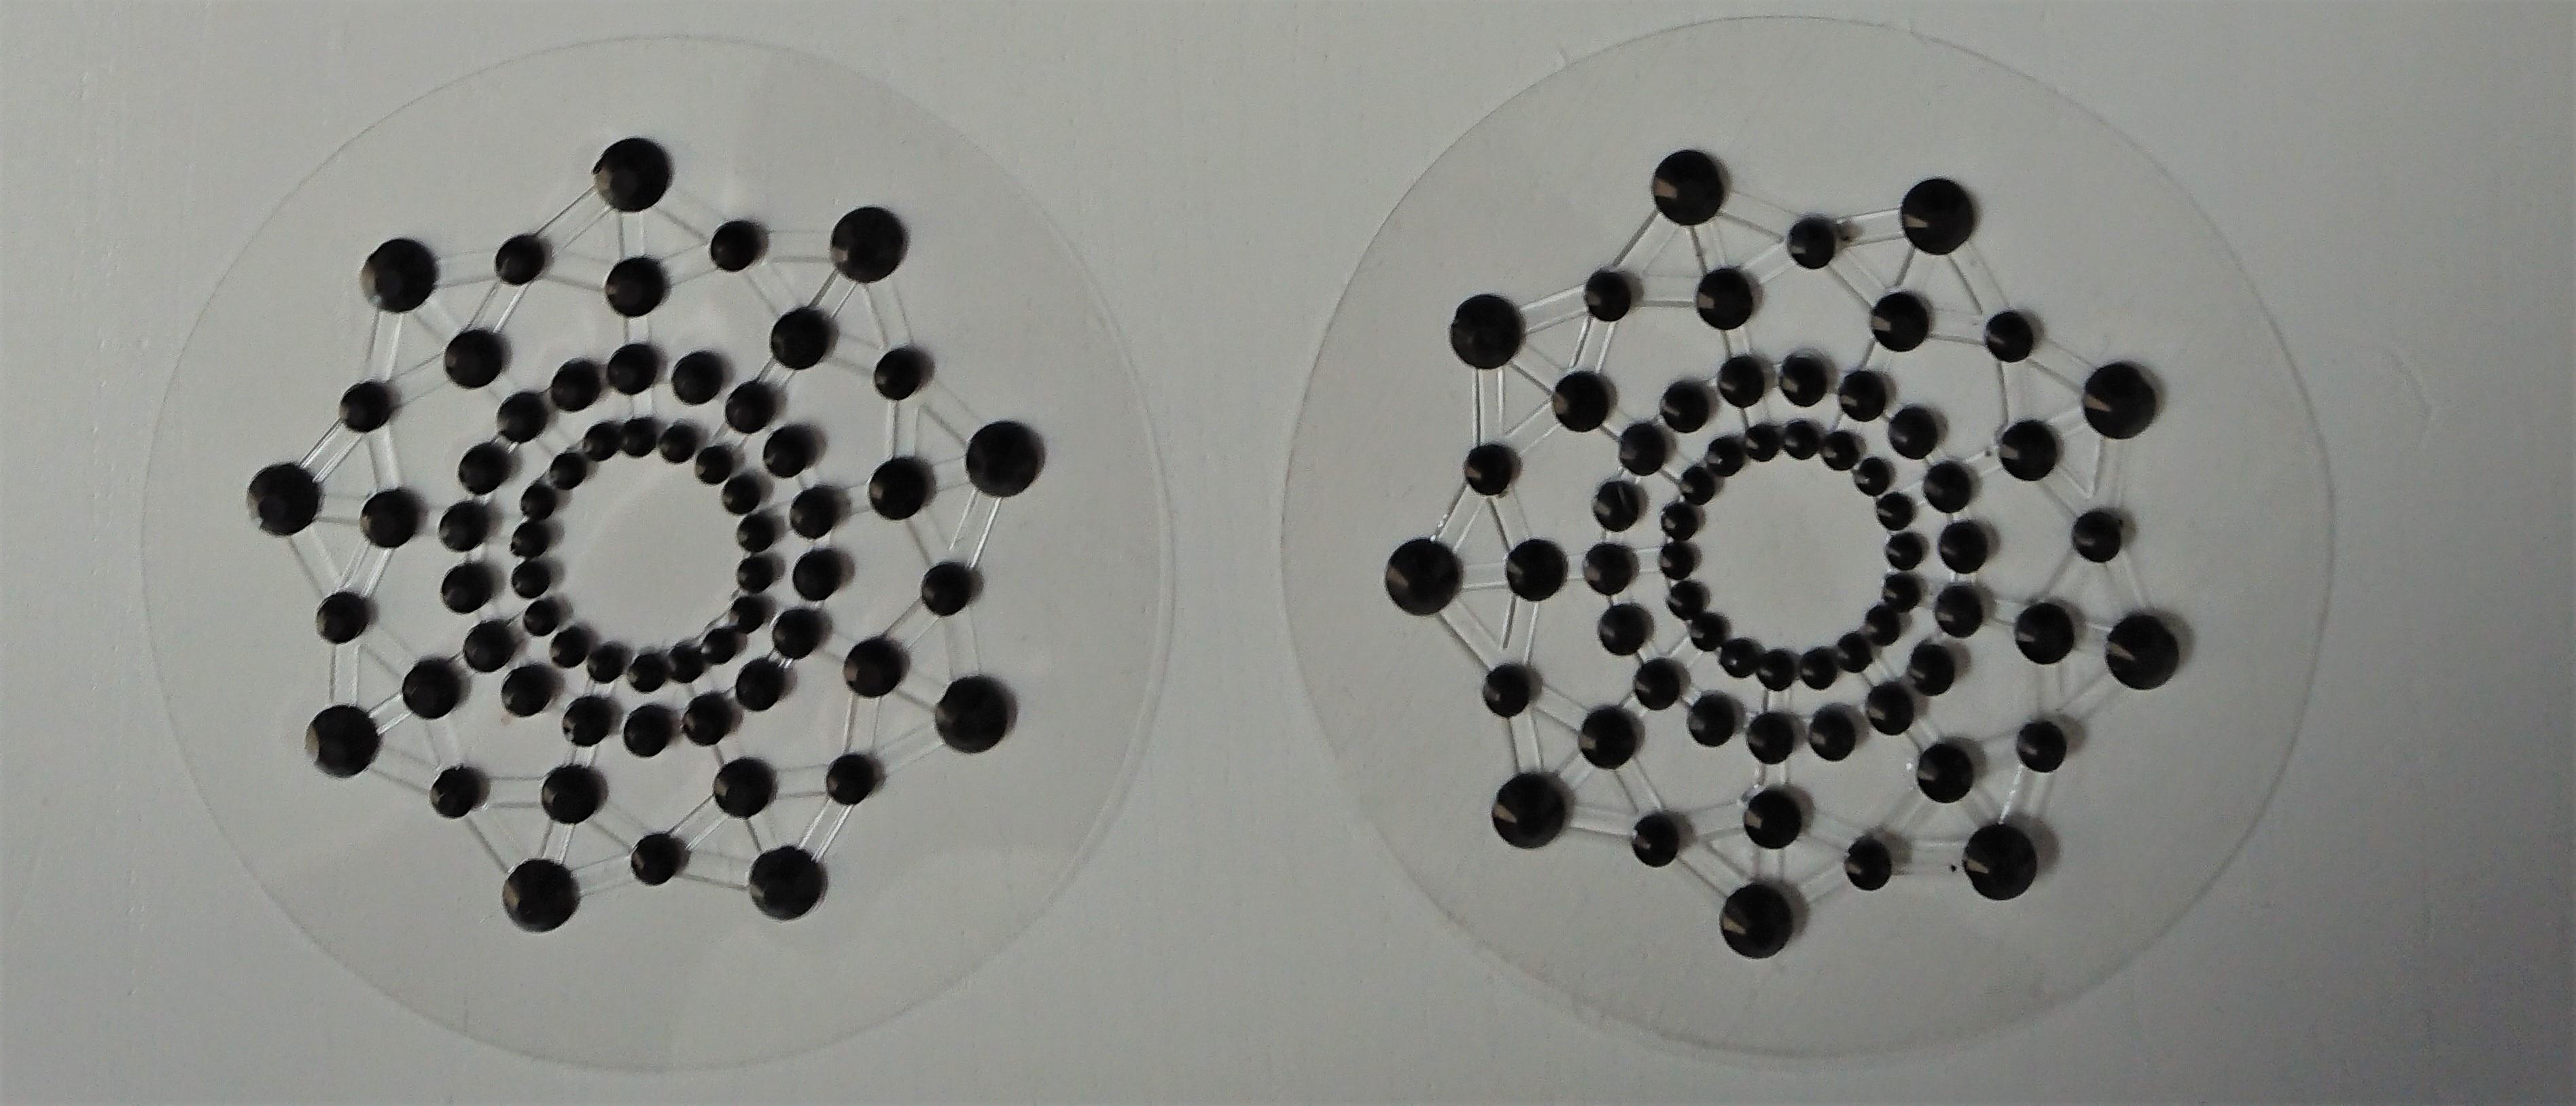 Self Adhesive Nippel Tepel Sticker Nipple Cover Women Reusable Pezon Pasties Temptation Nipple Covers Stickers Breast Petals